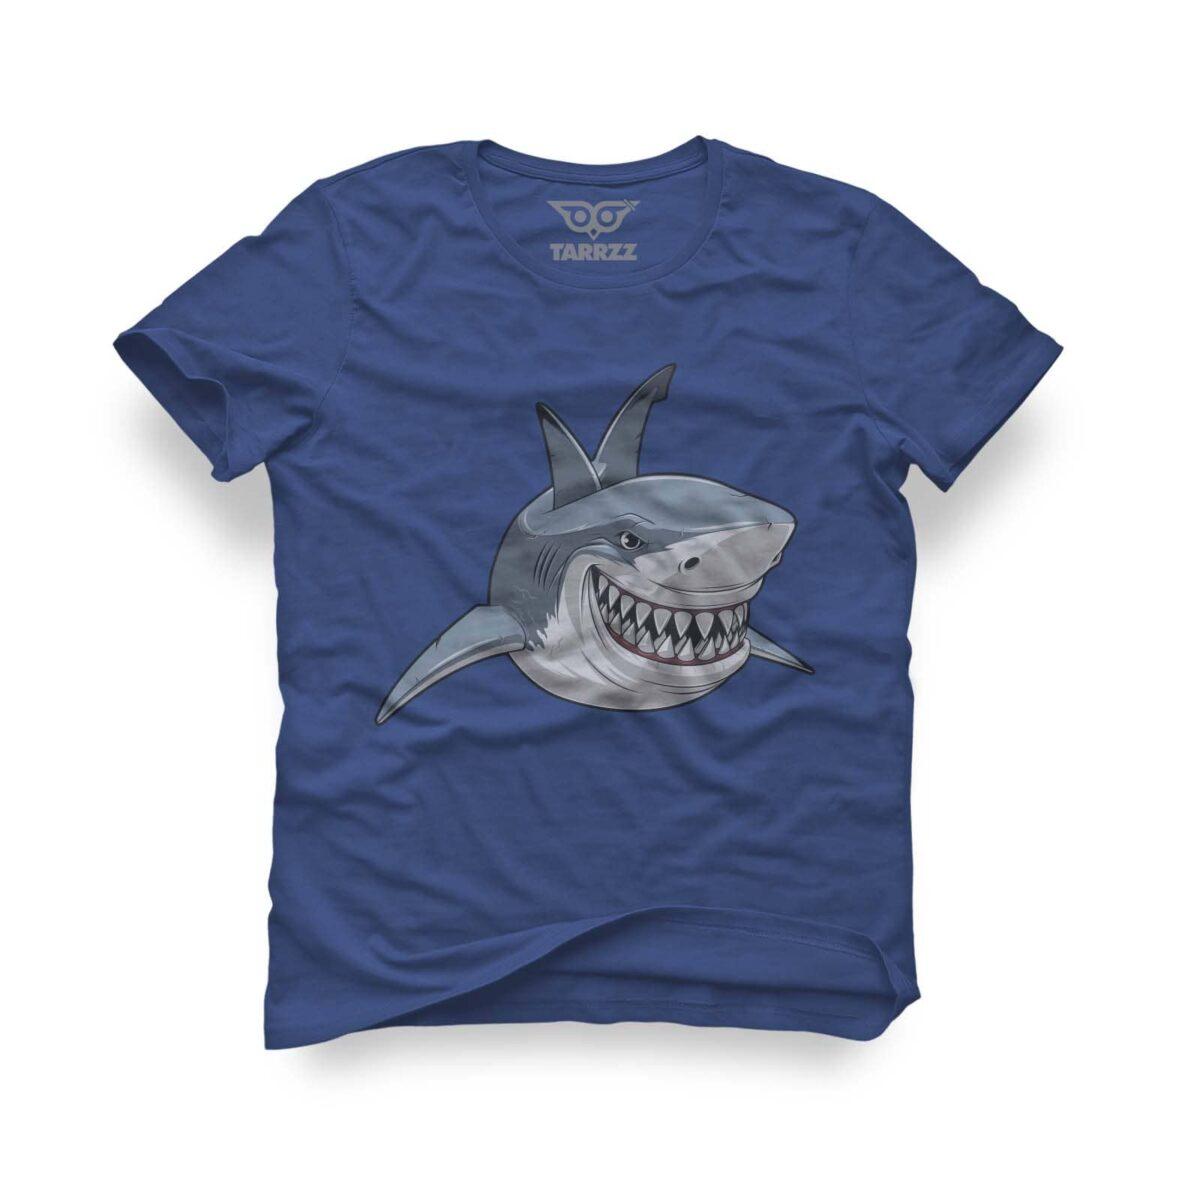 tarrzz-tasarim-marine-mavi-tisort-kopekbaligi-smile-like-a-shark